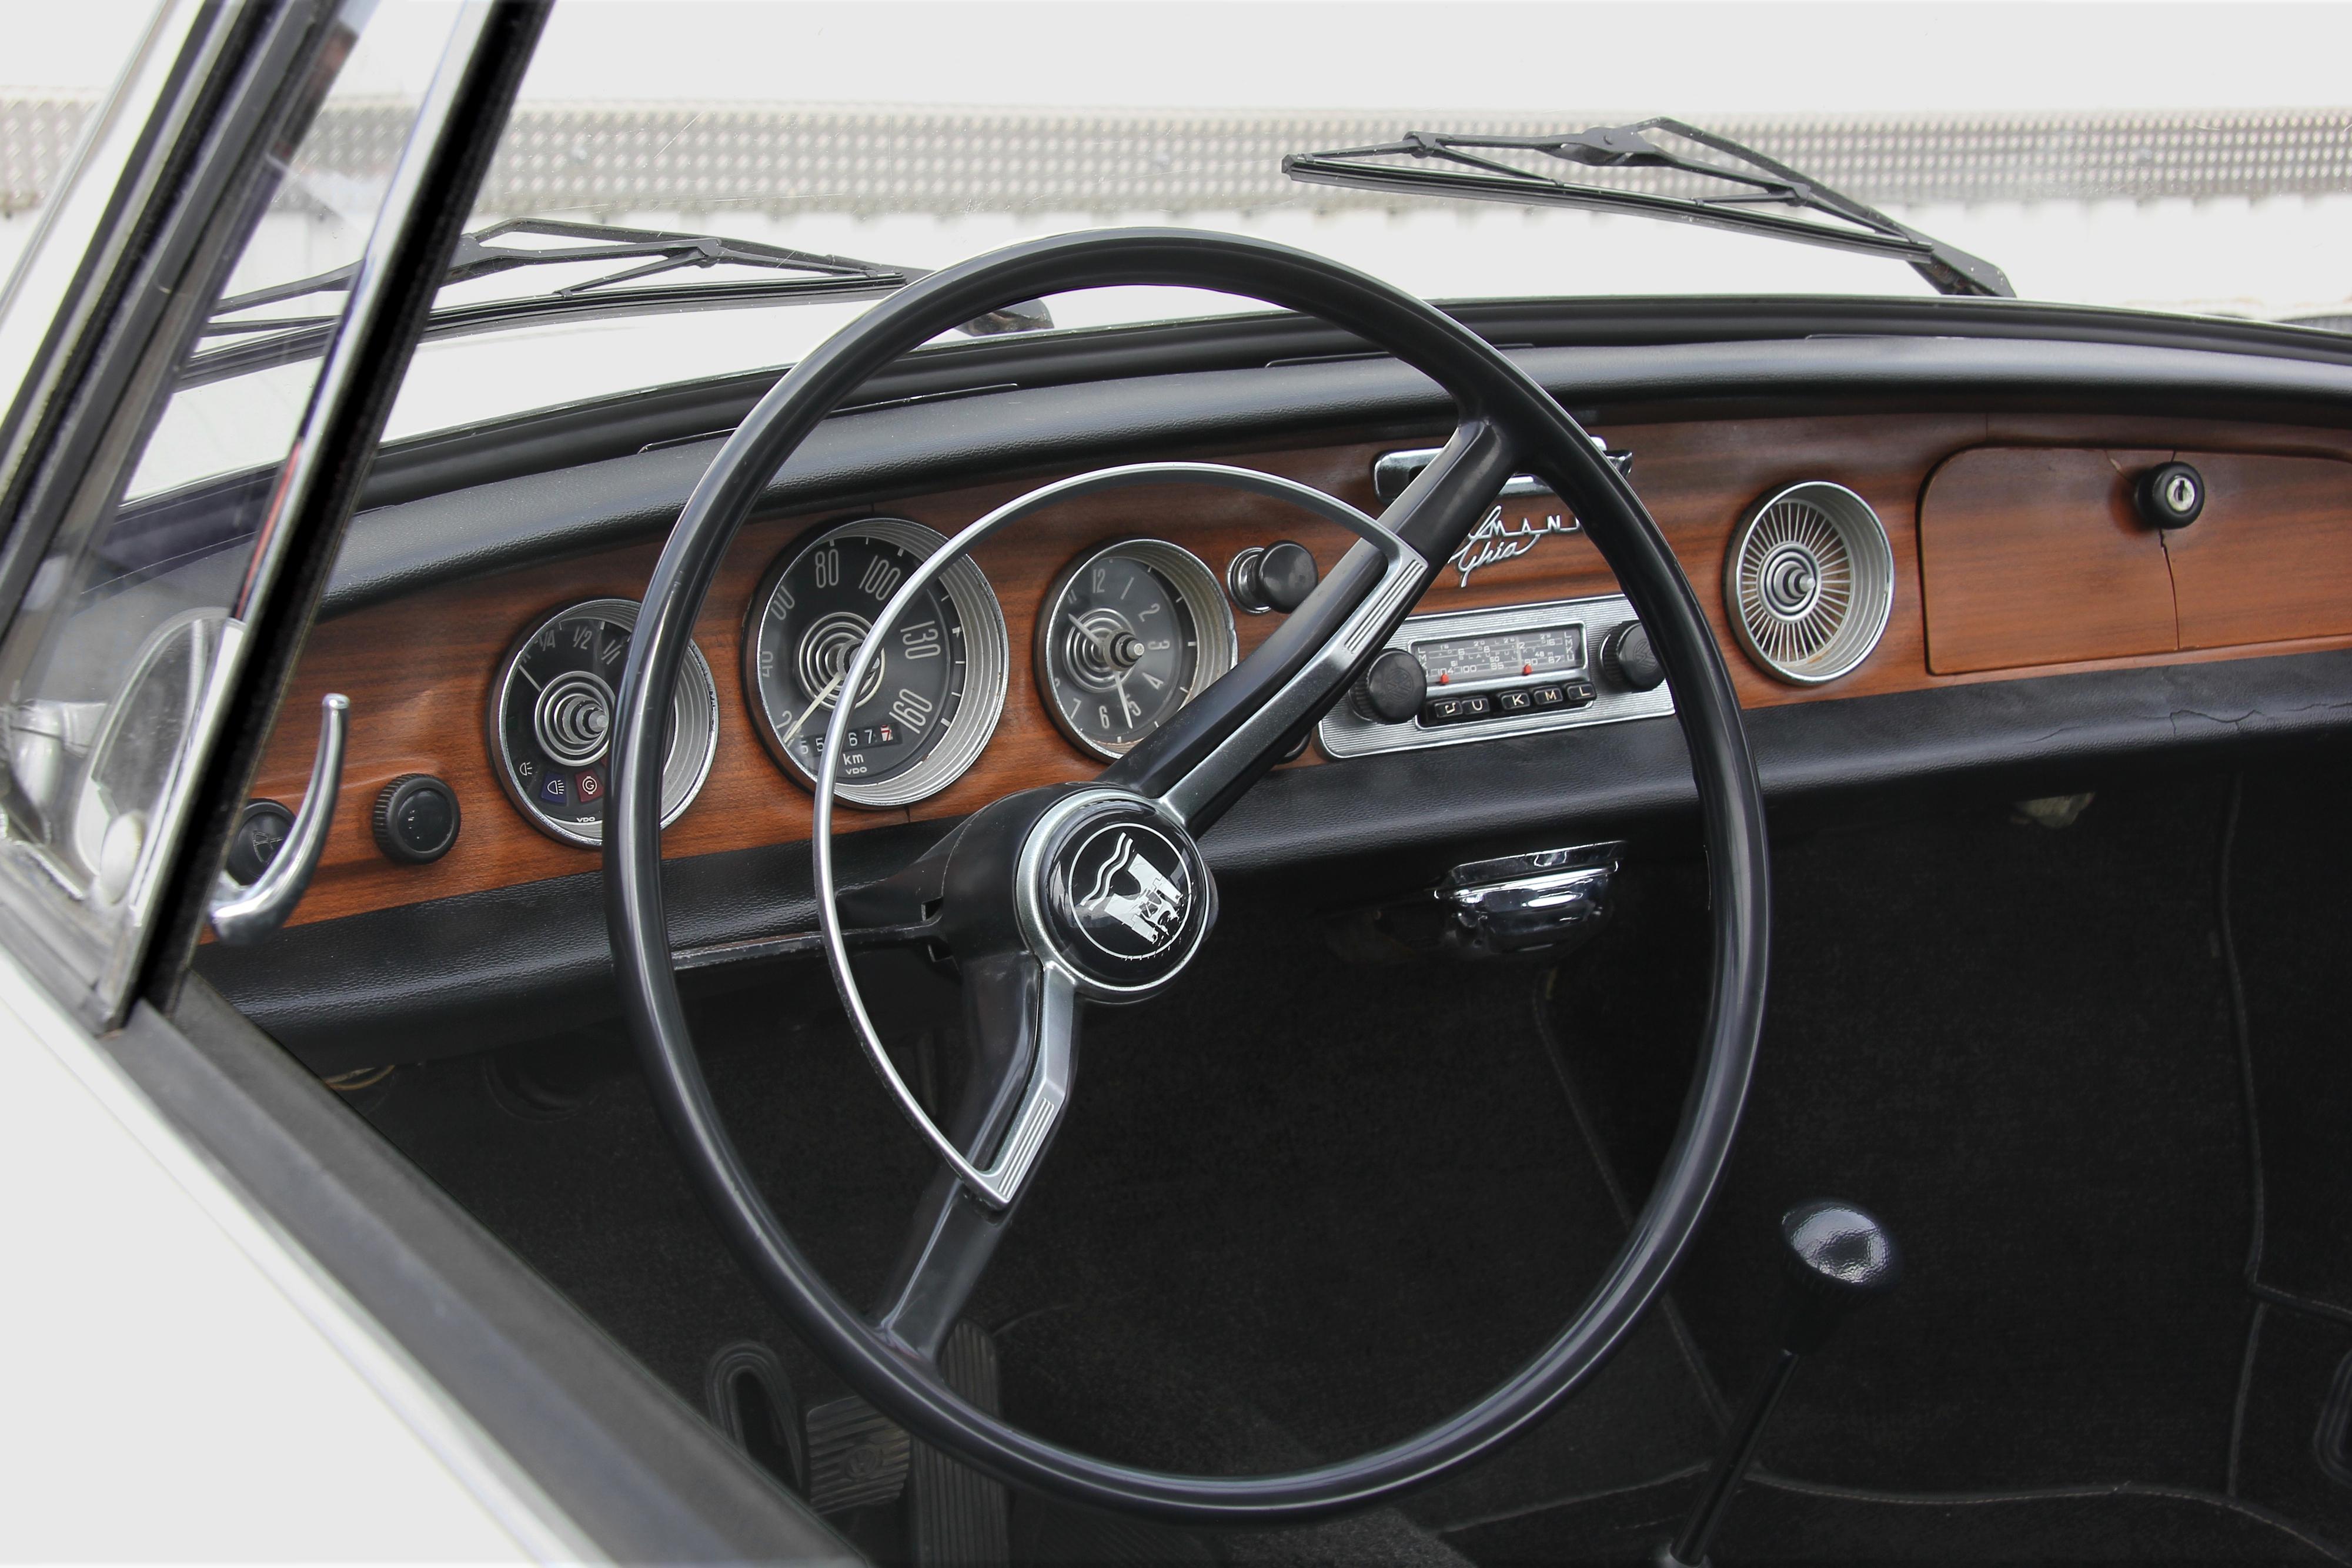 File:VW Karmann Ghia, Typ 34, Armaturenbrett (Sp).JPG - Wikimedia Commons